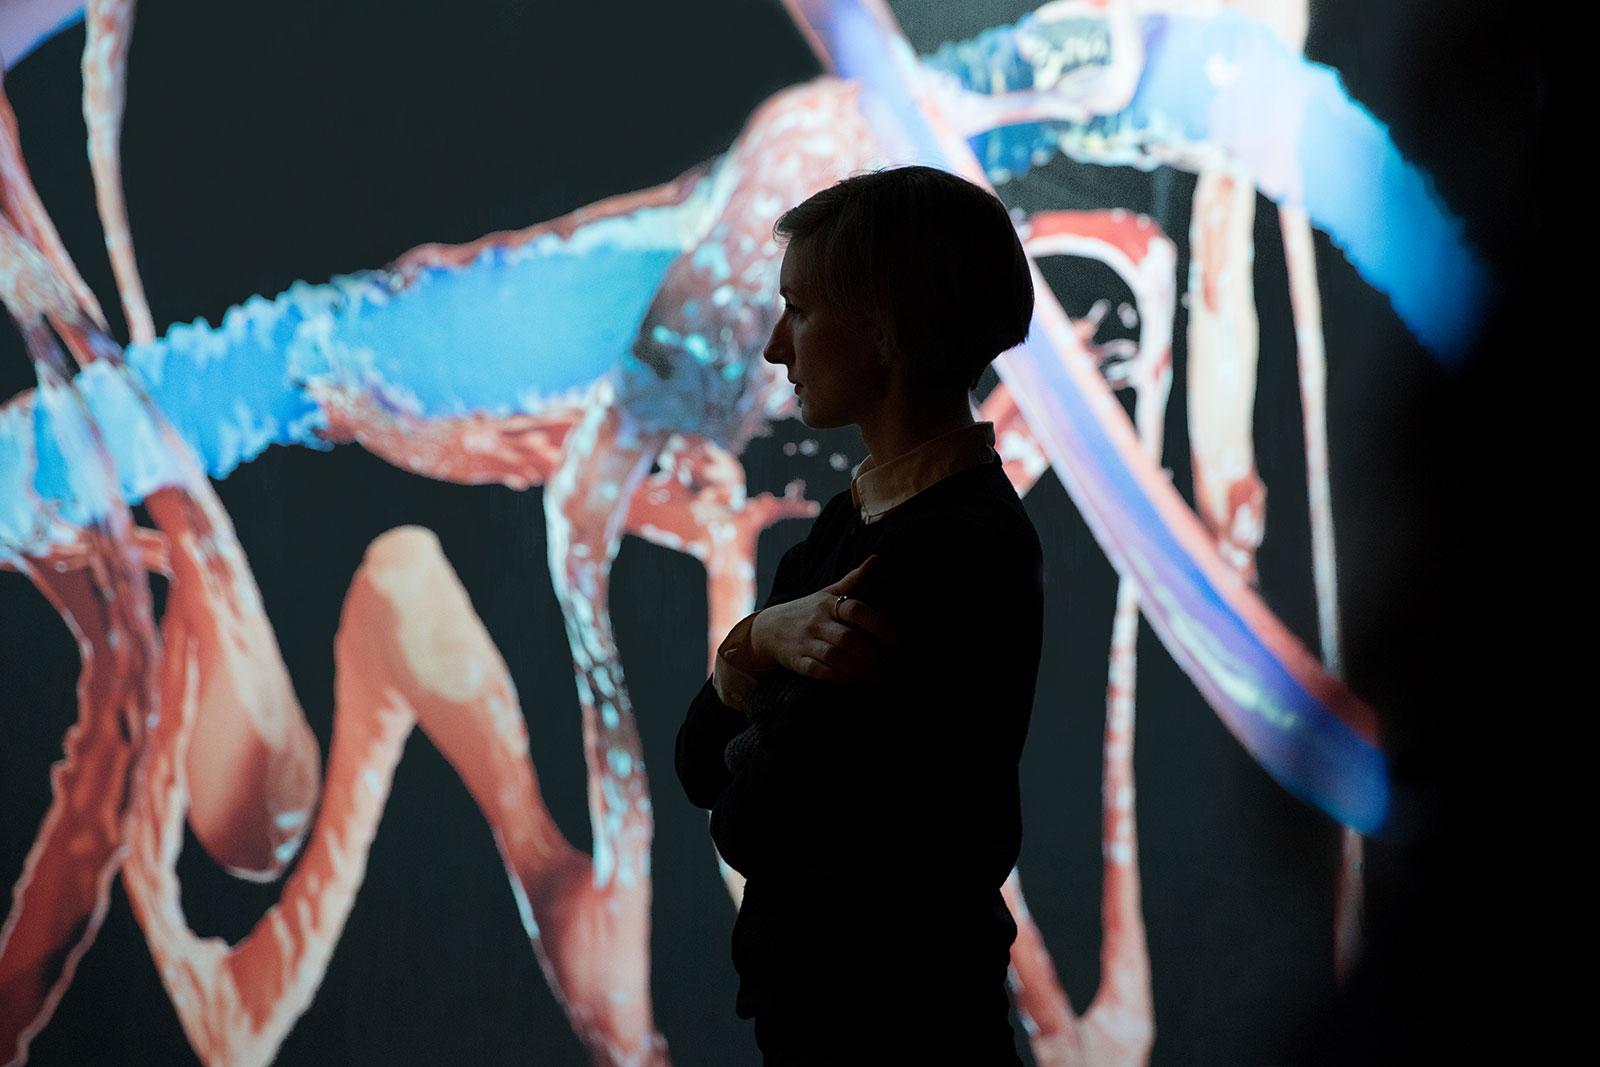 Sinus & Cosinus, Salon des Amateurs, 2015, Foto by Anna Siggelkow